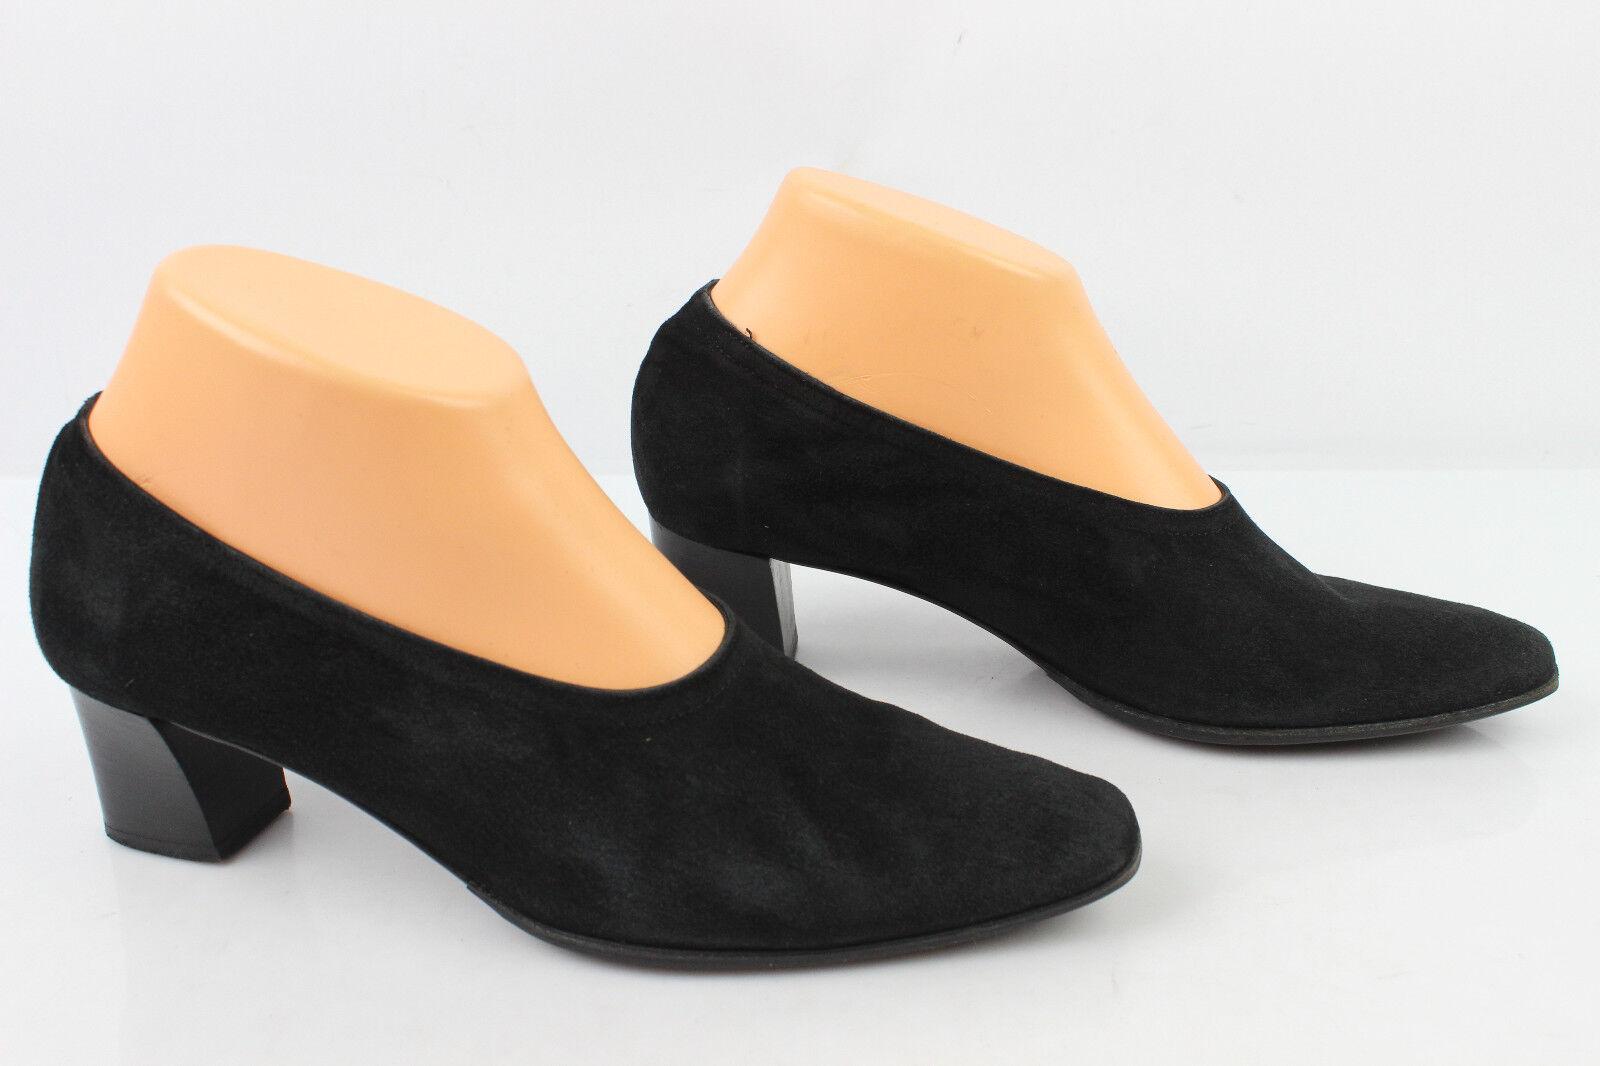 Court shoes JEAN-PAUL BARRIOL All Leather Suede Flexible Black T 37